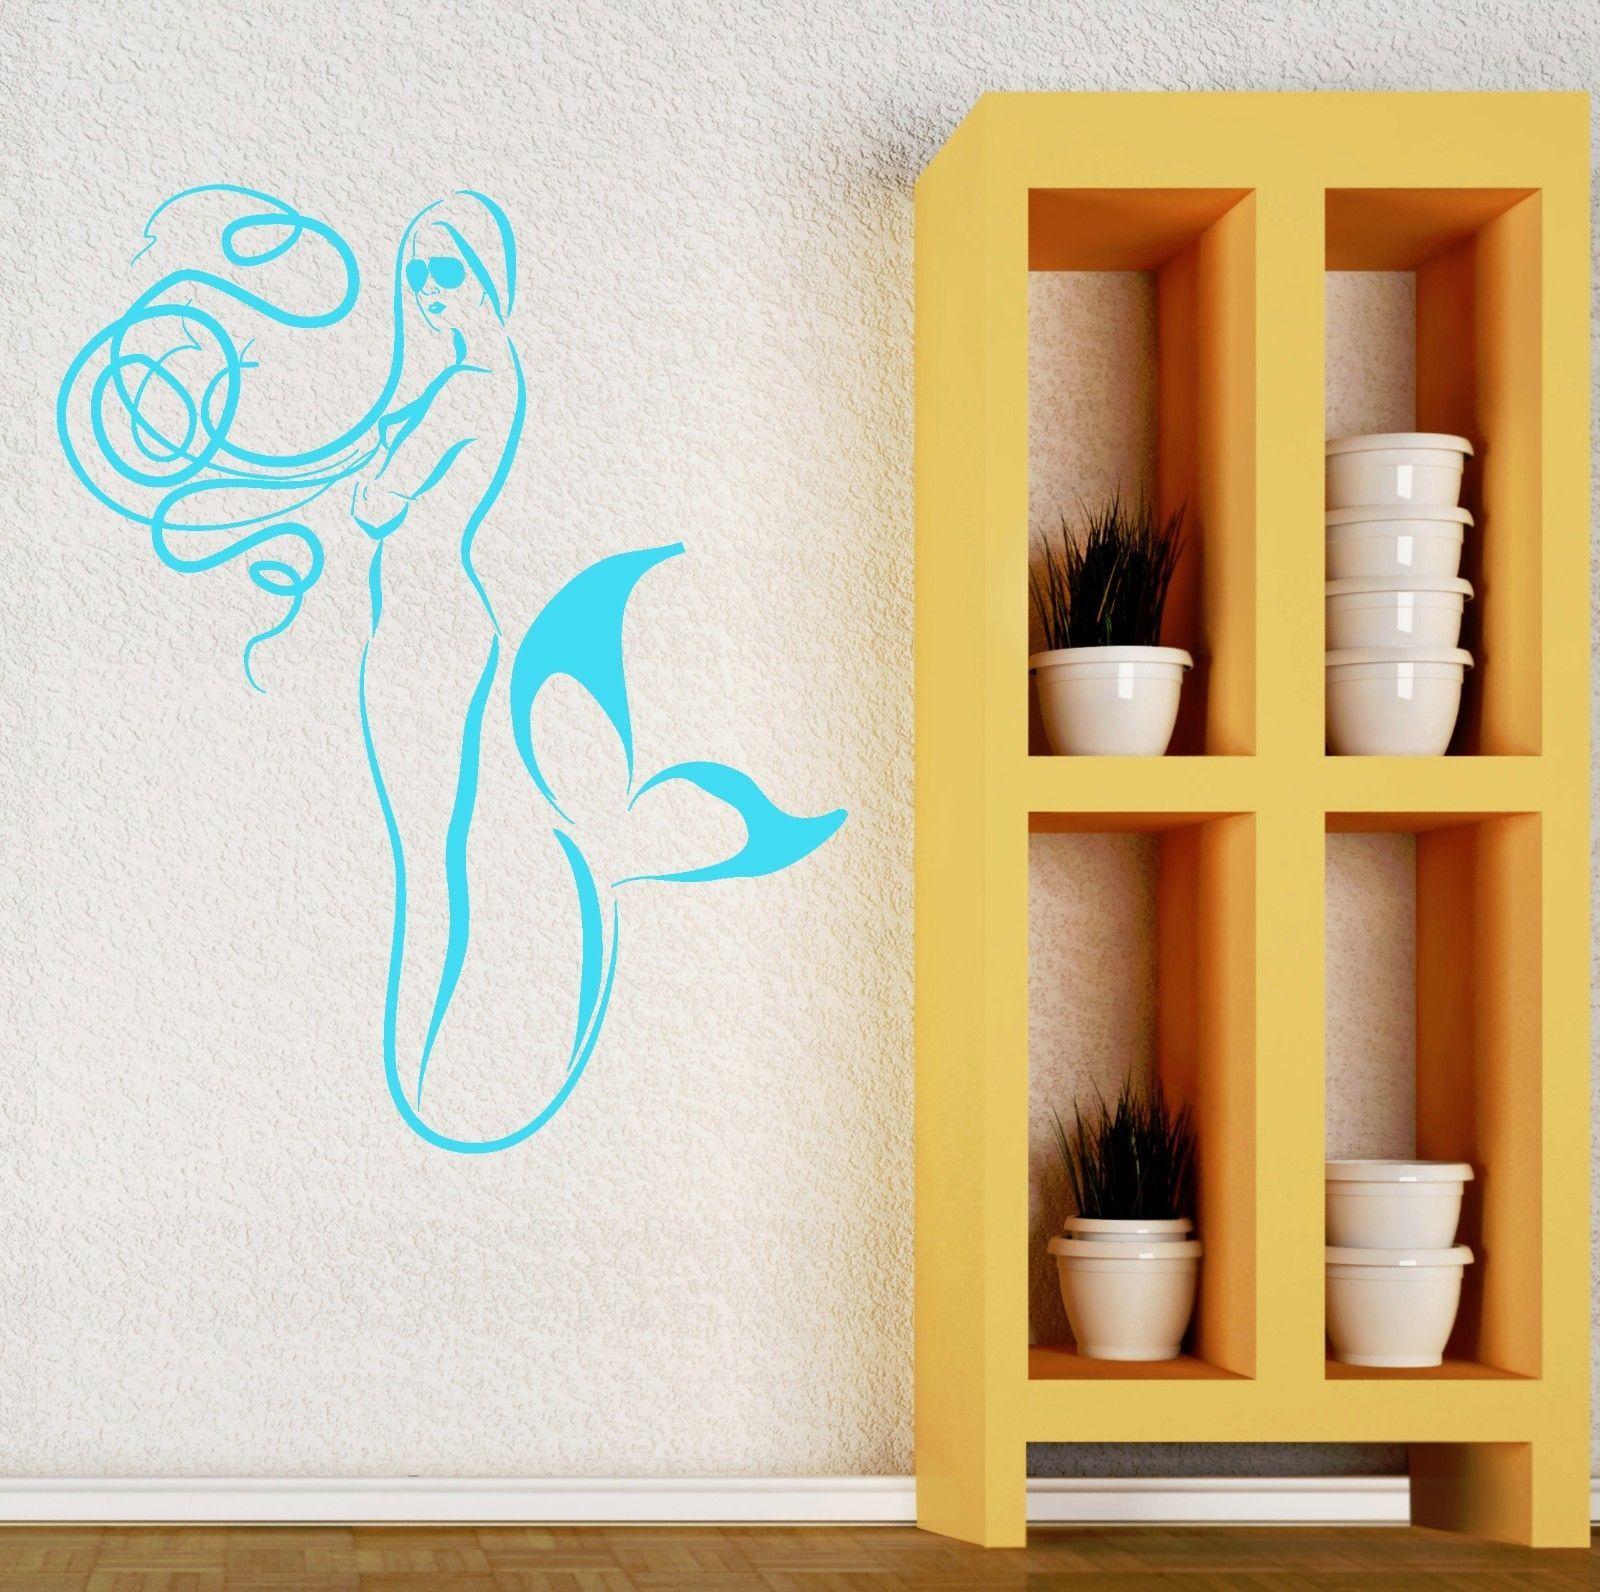 Wall sticker vinyl decal mermaid marine sea decor bathroom for Bathroom vinyl decor